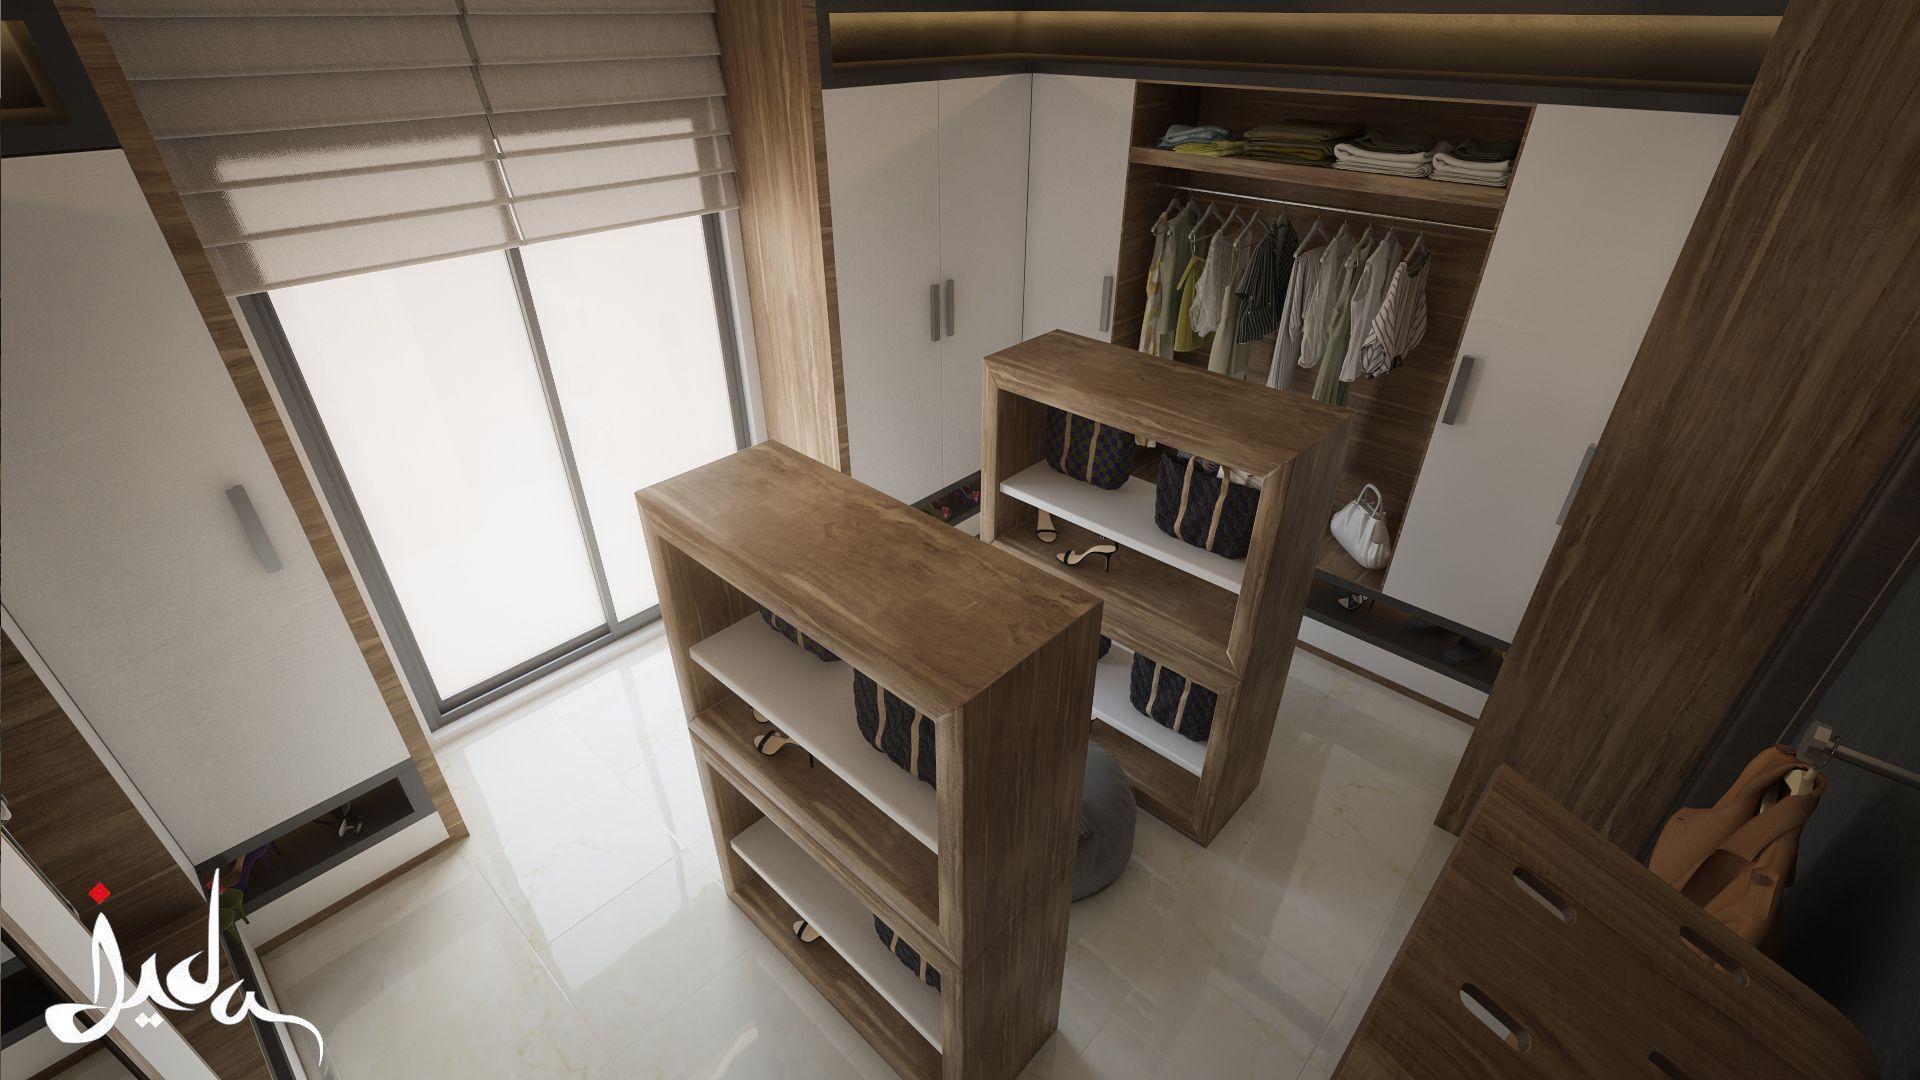 Dressing Room By Jida For More Details Contact Us 920006386 تصميم داخلي تصميم معماري منازل تصميمات Interior Design Architect Design Design